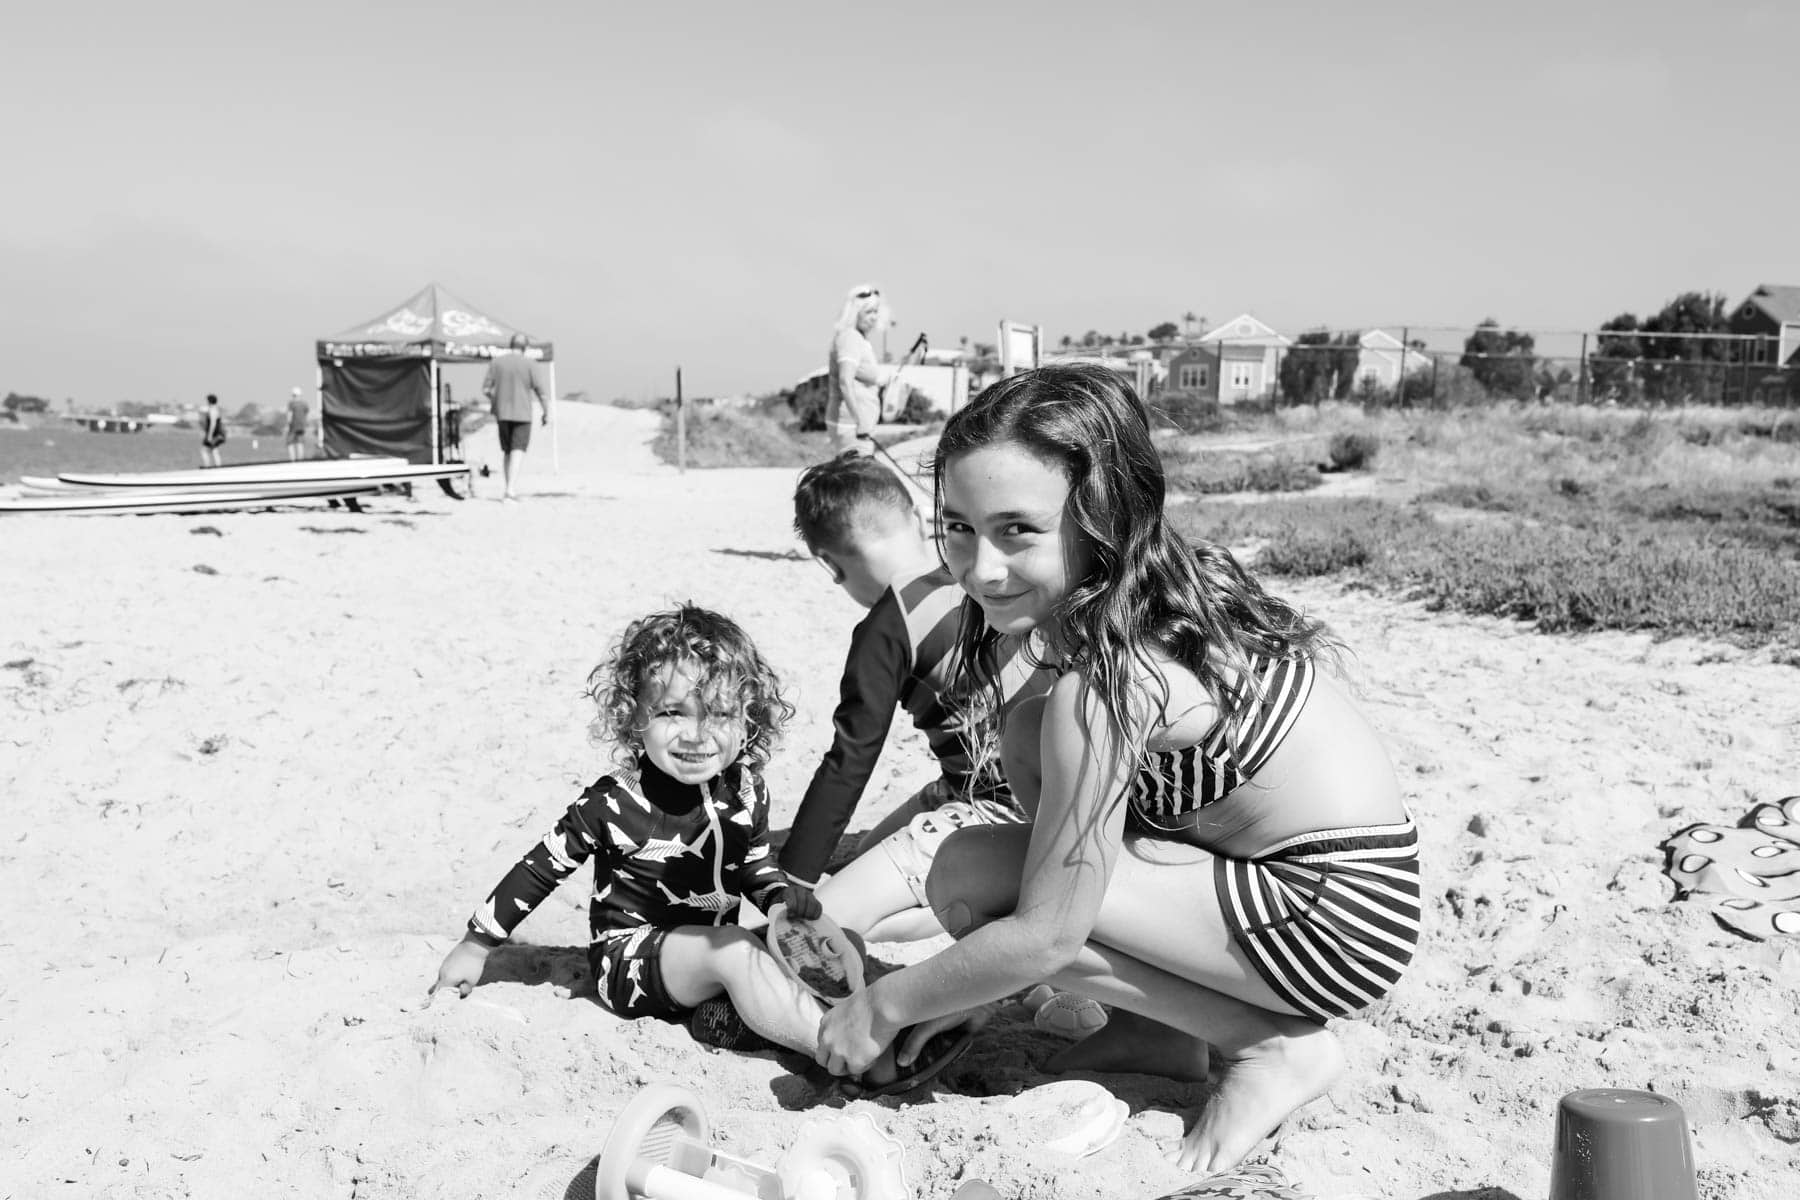 Kids enjoying the Sand #familytravelsandiego #sandiego #fourseasonsresidenceclub #bigfamilytravel